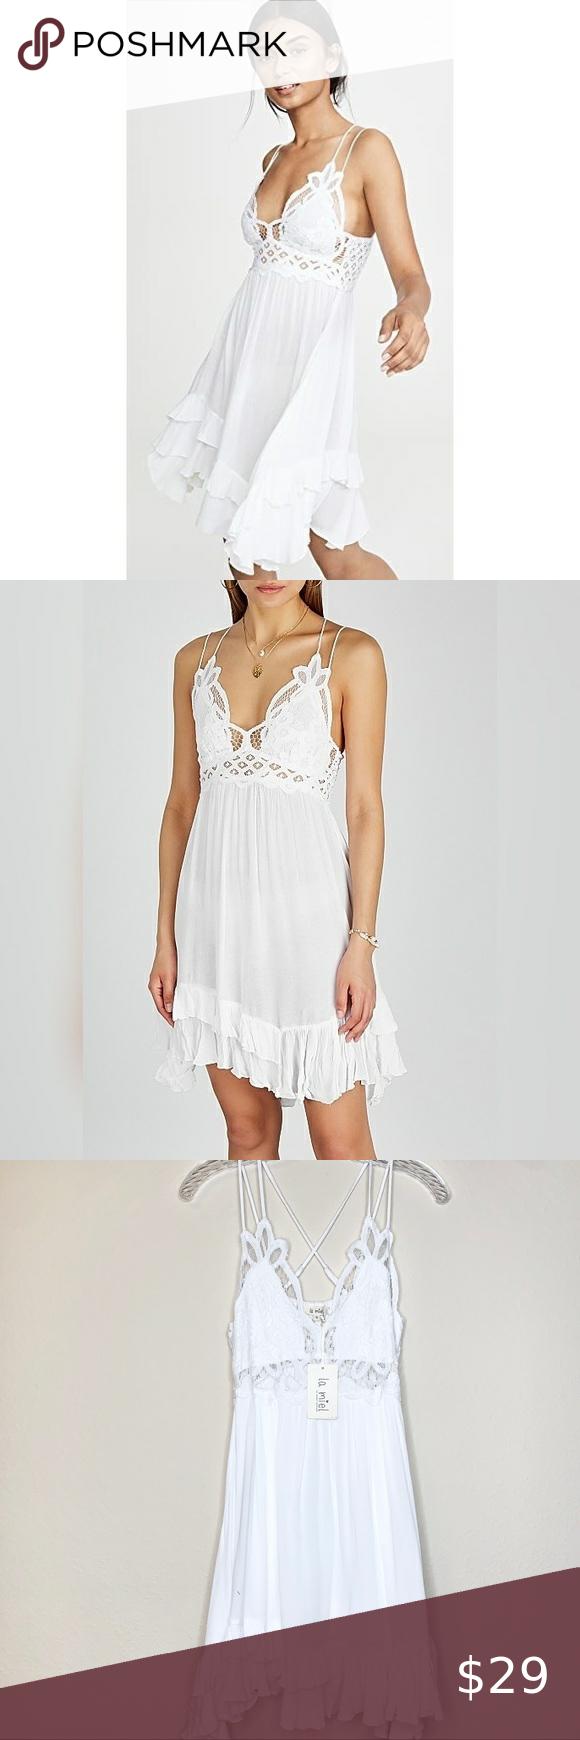 4 For 25 La Miel White Lace Slip Dress Lace Slip Dress Slip Dress Lace Slip [ 1740 x 580 Pixel ]